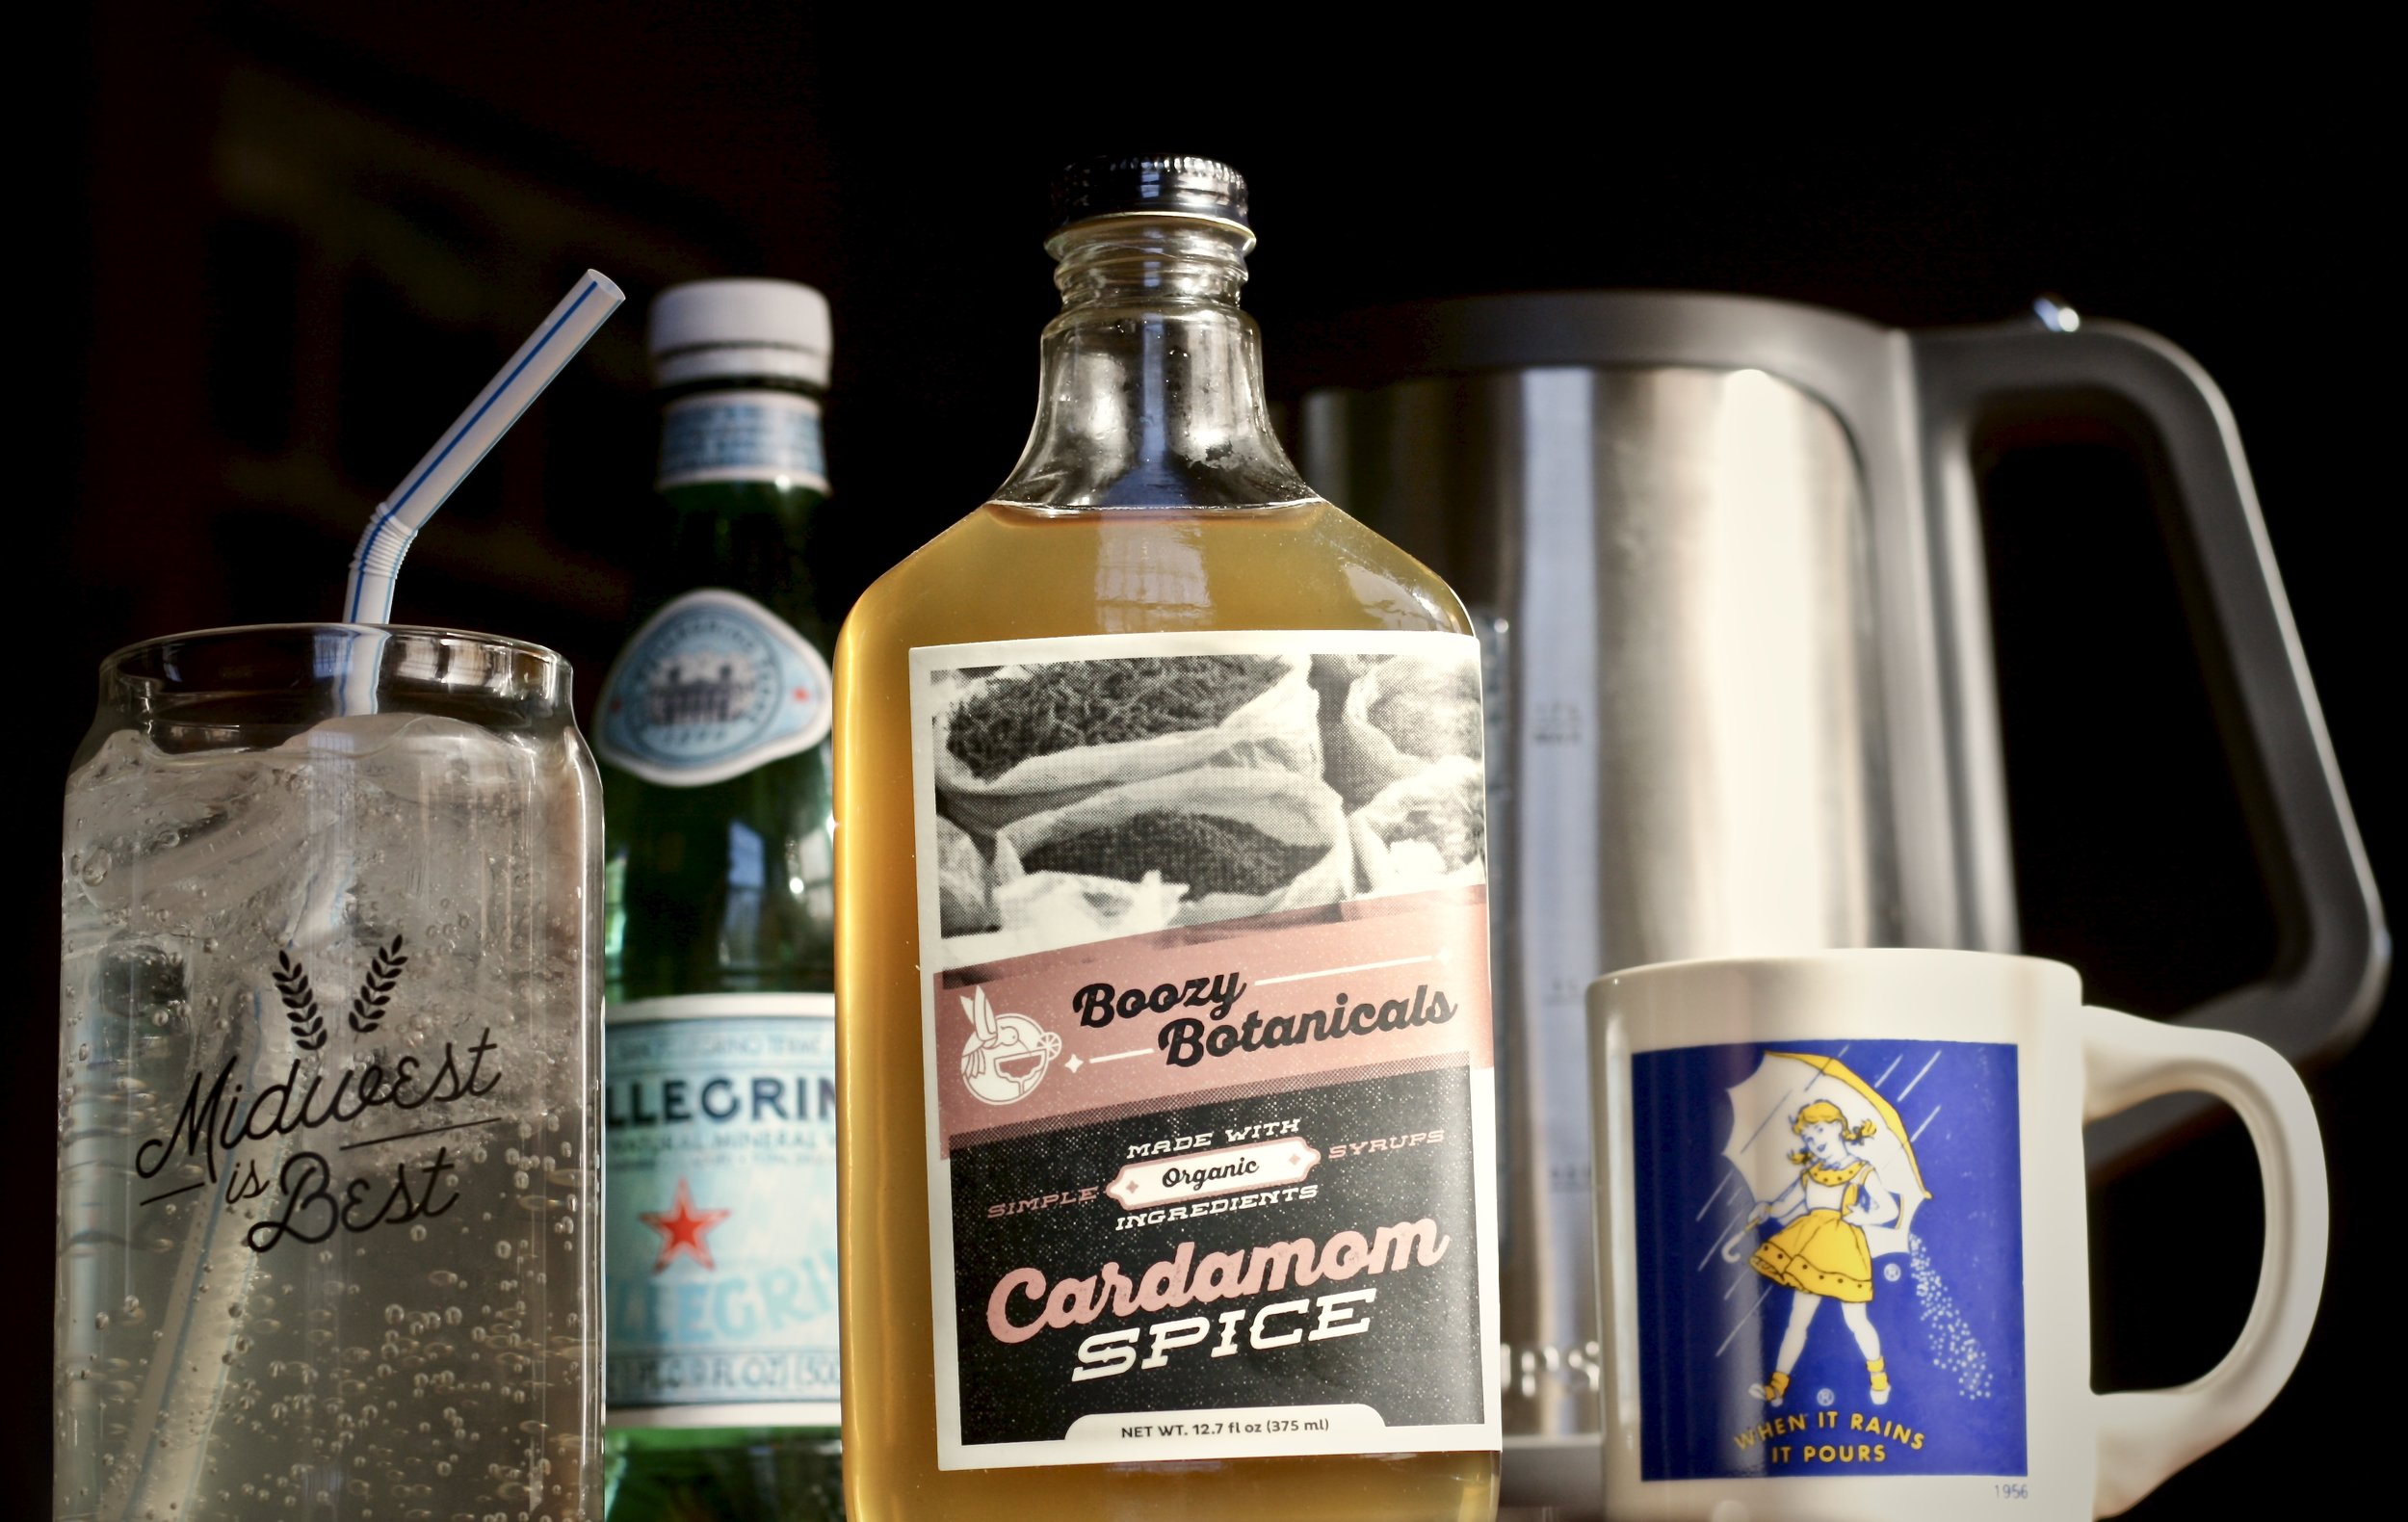 Online Farmers Market, Farmers Market, Boozy Botanicals, Organic Infused Syrups